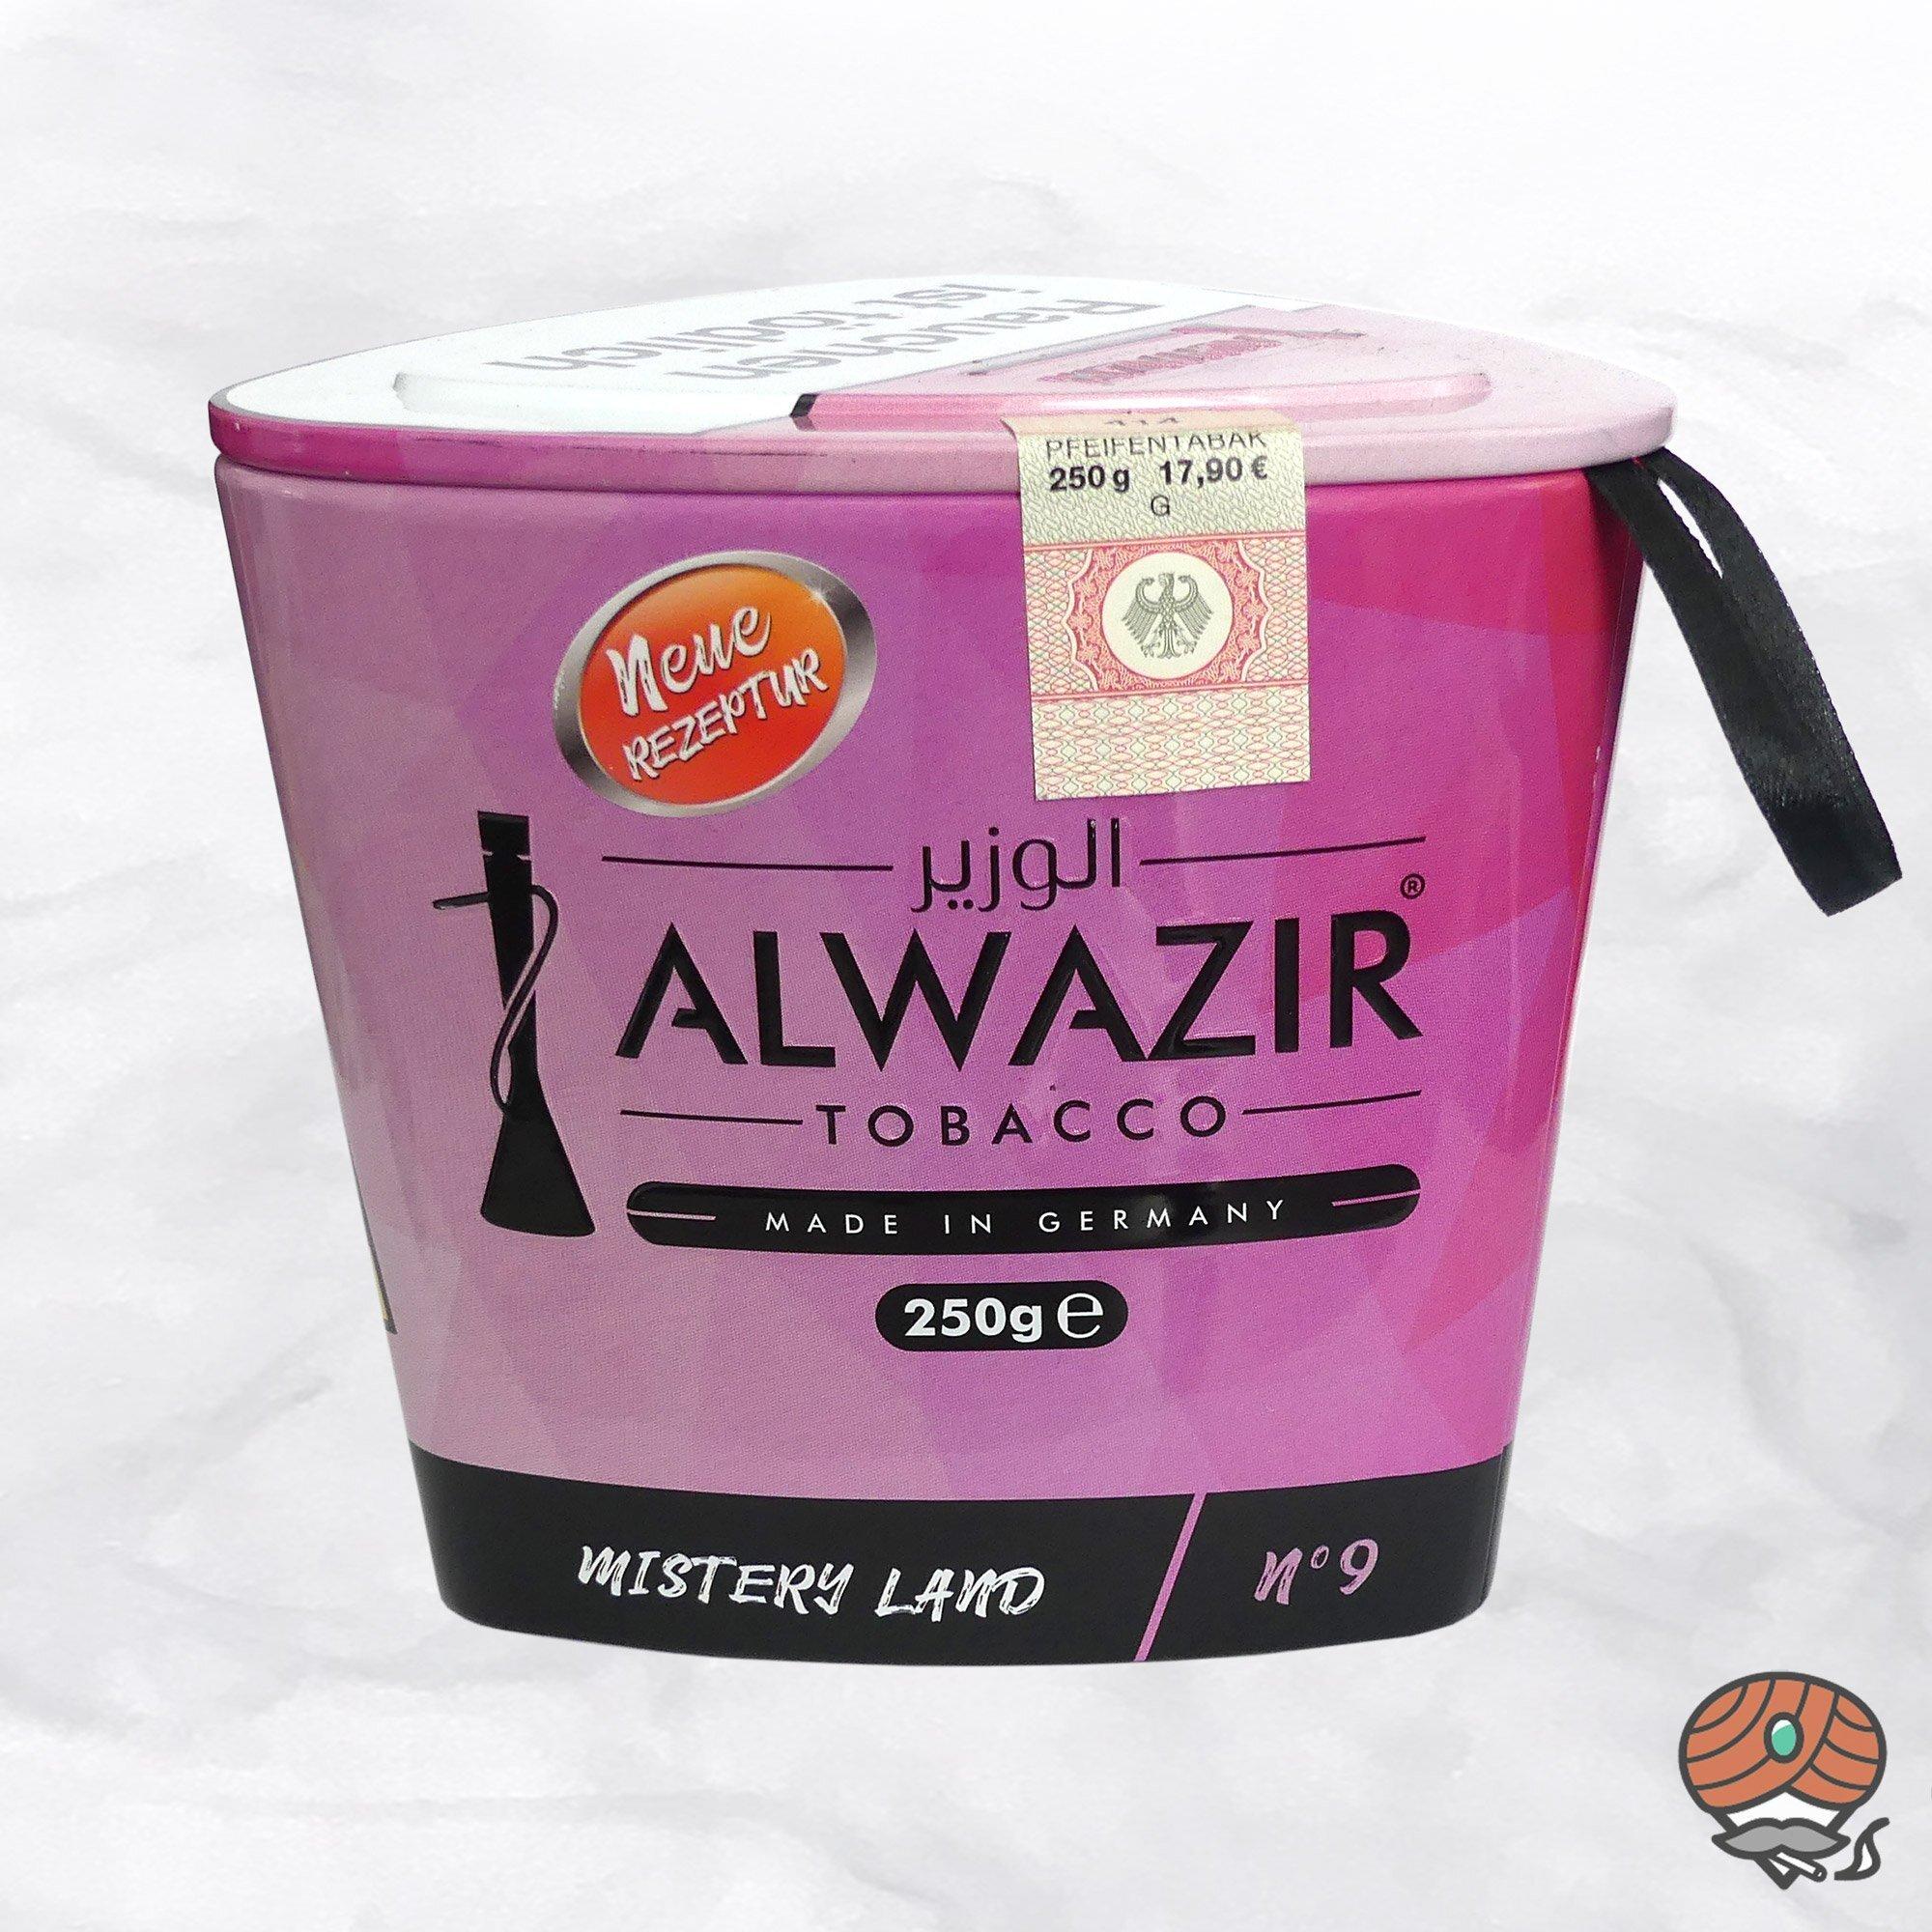 Alwazir Shisha Tabak - No. 9 - MISTERY LAND 250g